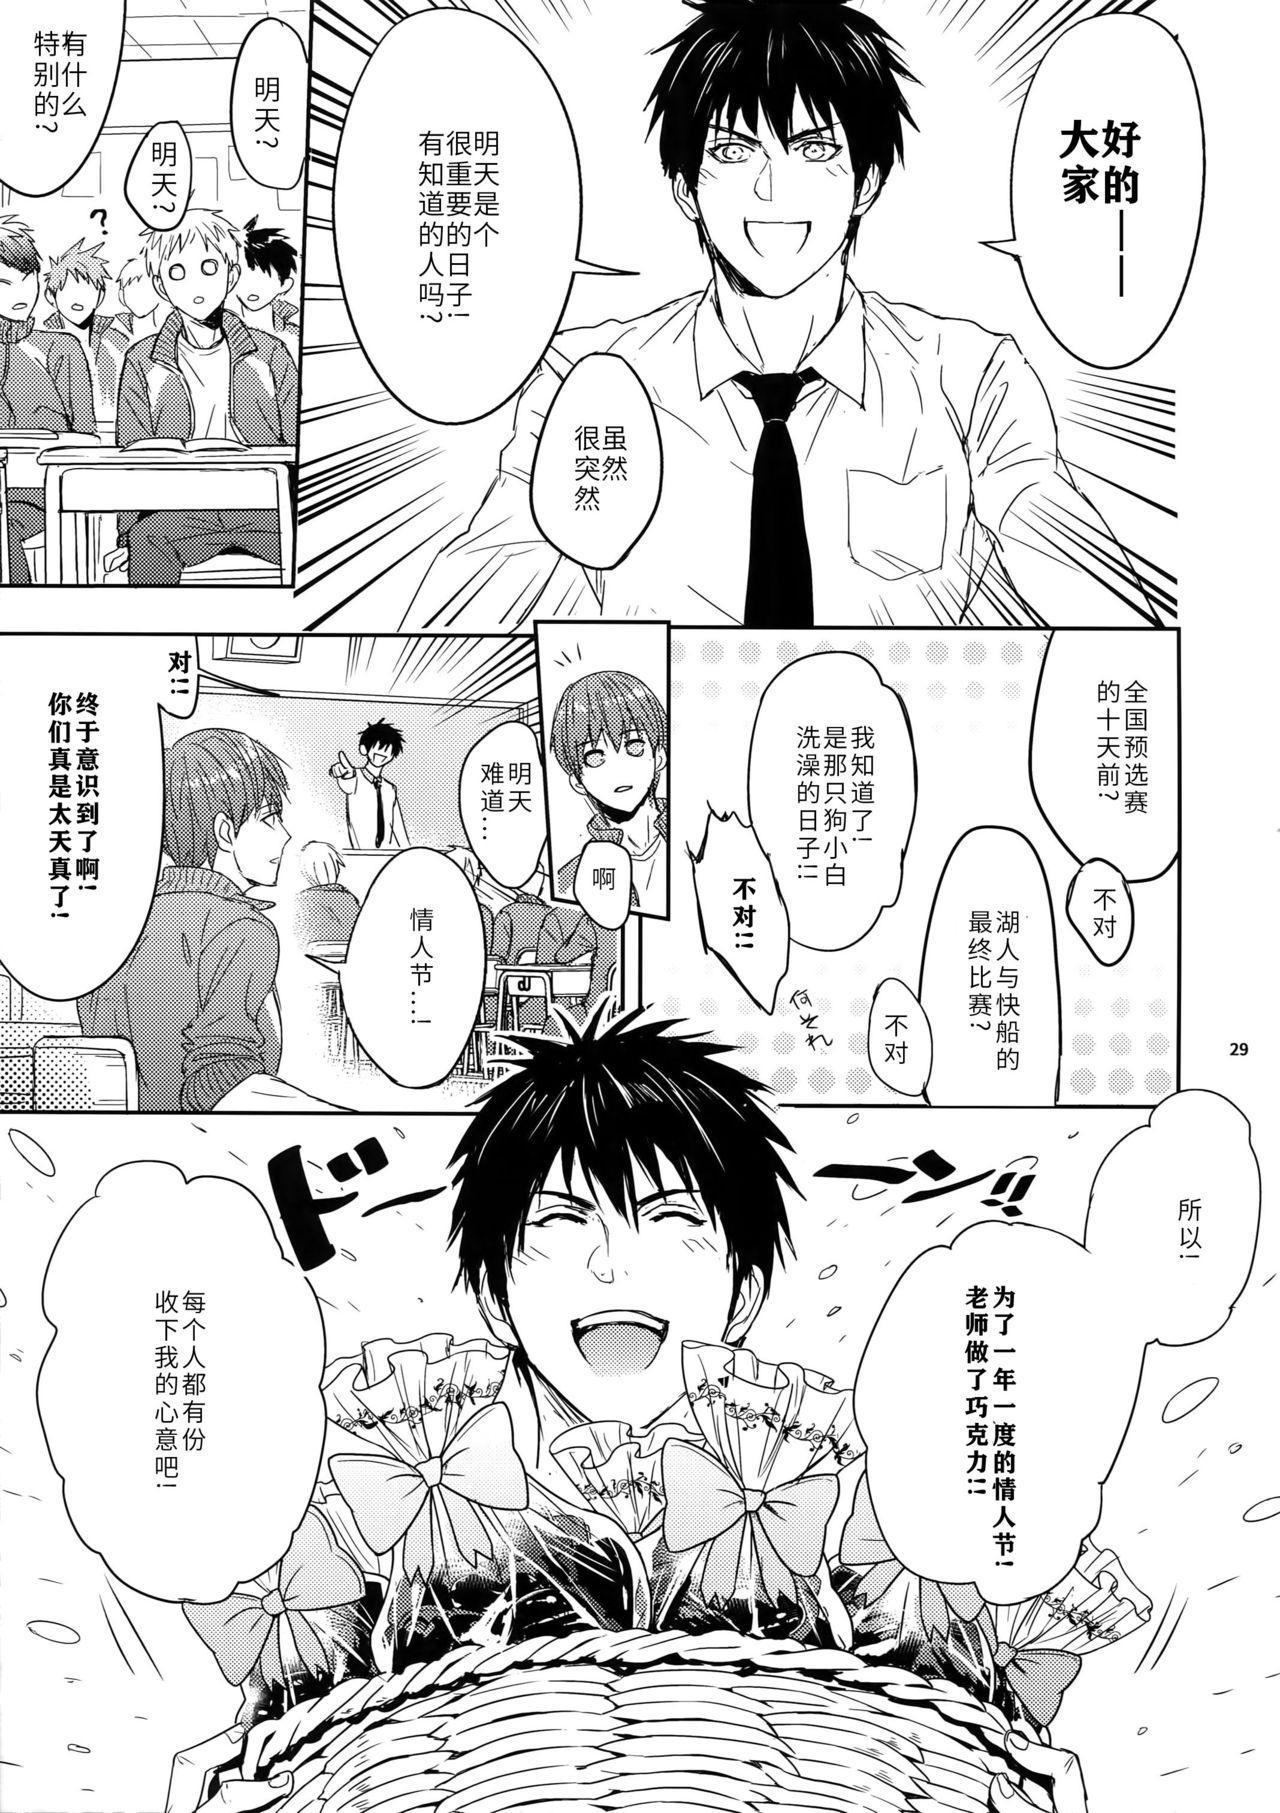 Sensei wa Nekketsu ga Areba Juubunda! | 老师只要热血就够了! 28